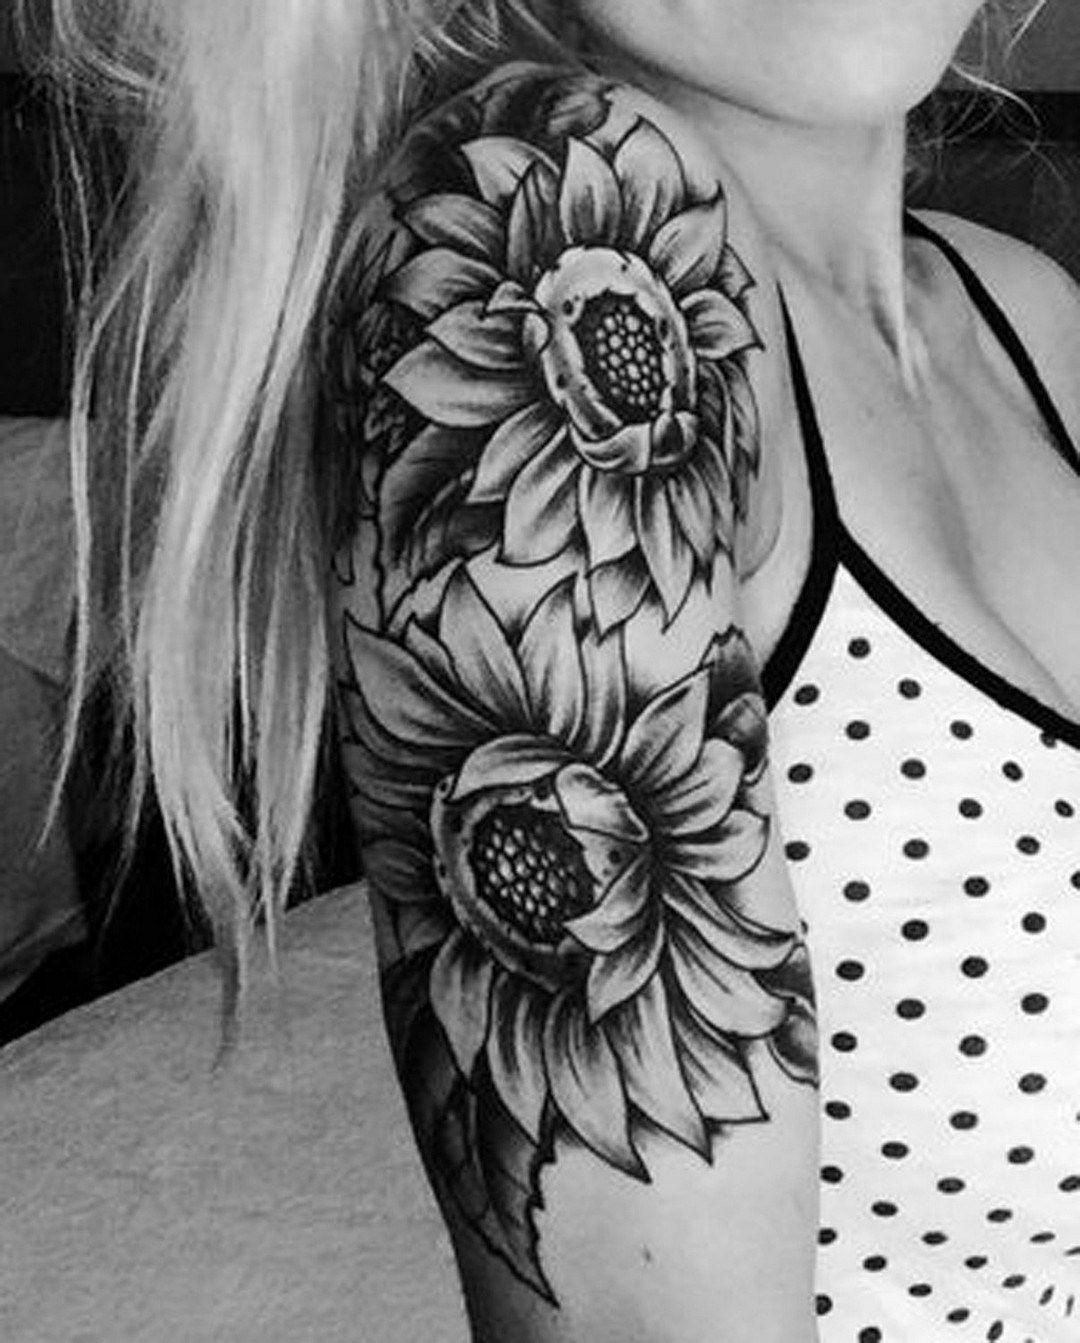 Amazing sleeve tattoos for women tattoosforwomensexys